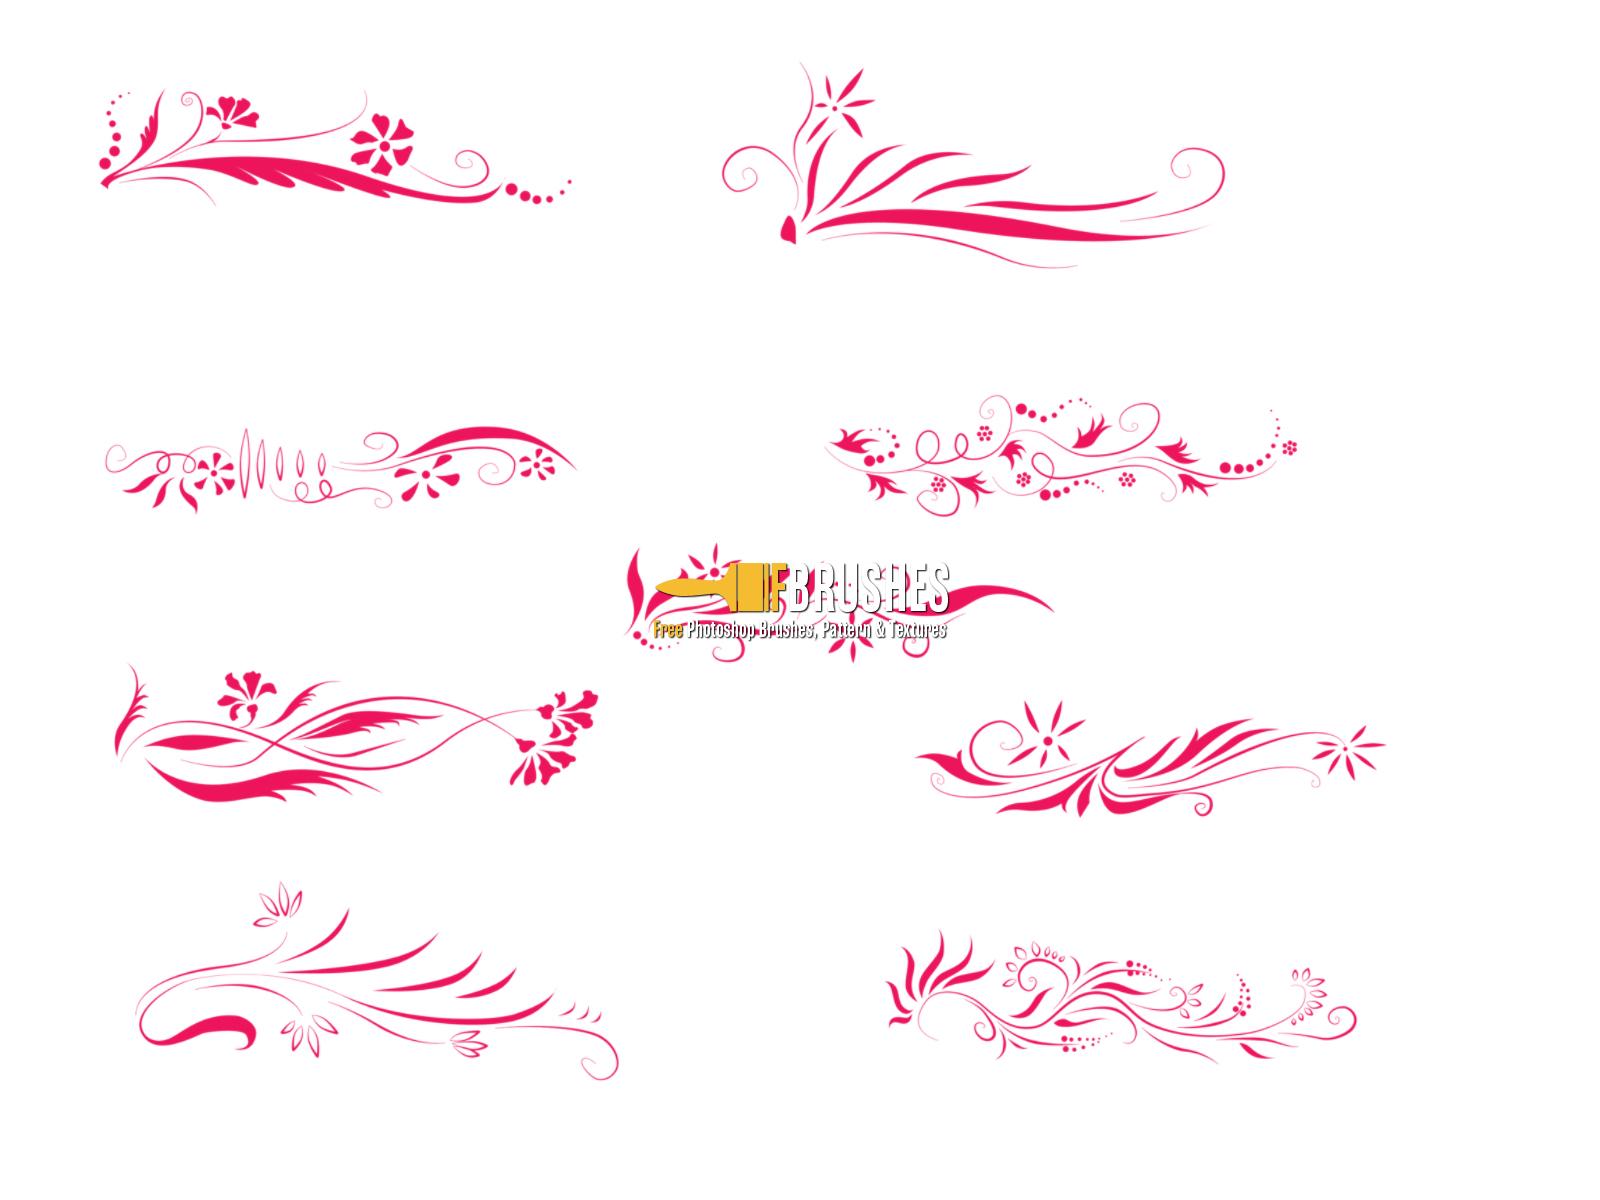 floral border lines - brushes